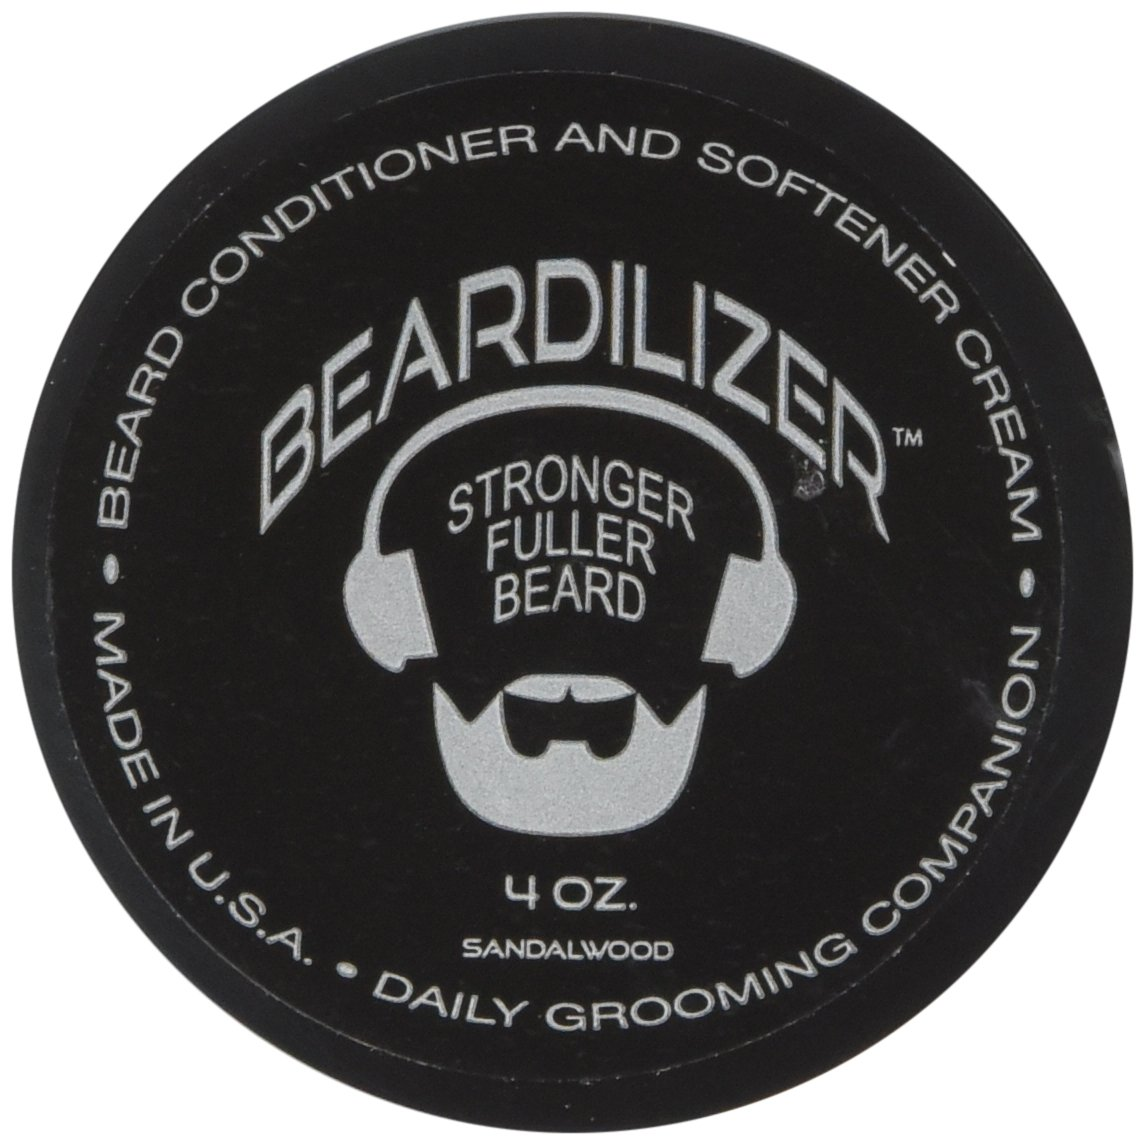 Cream to Help Beard Growth, Beardilizer Beard Cream